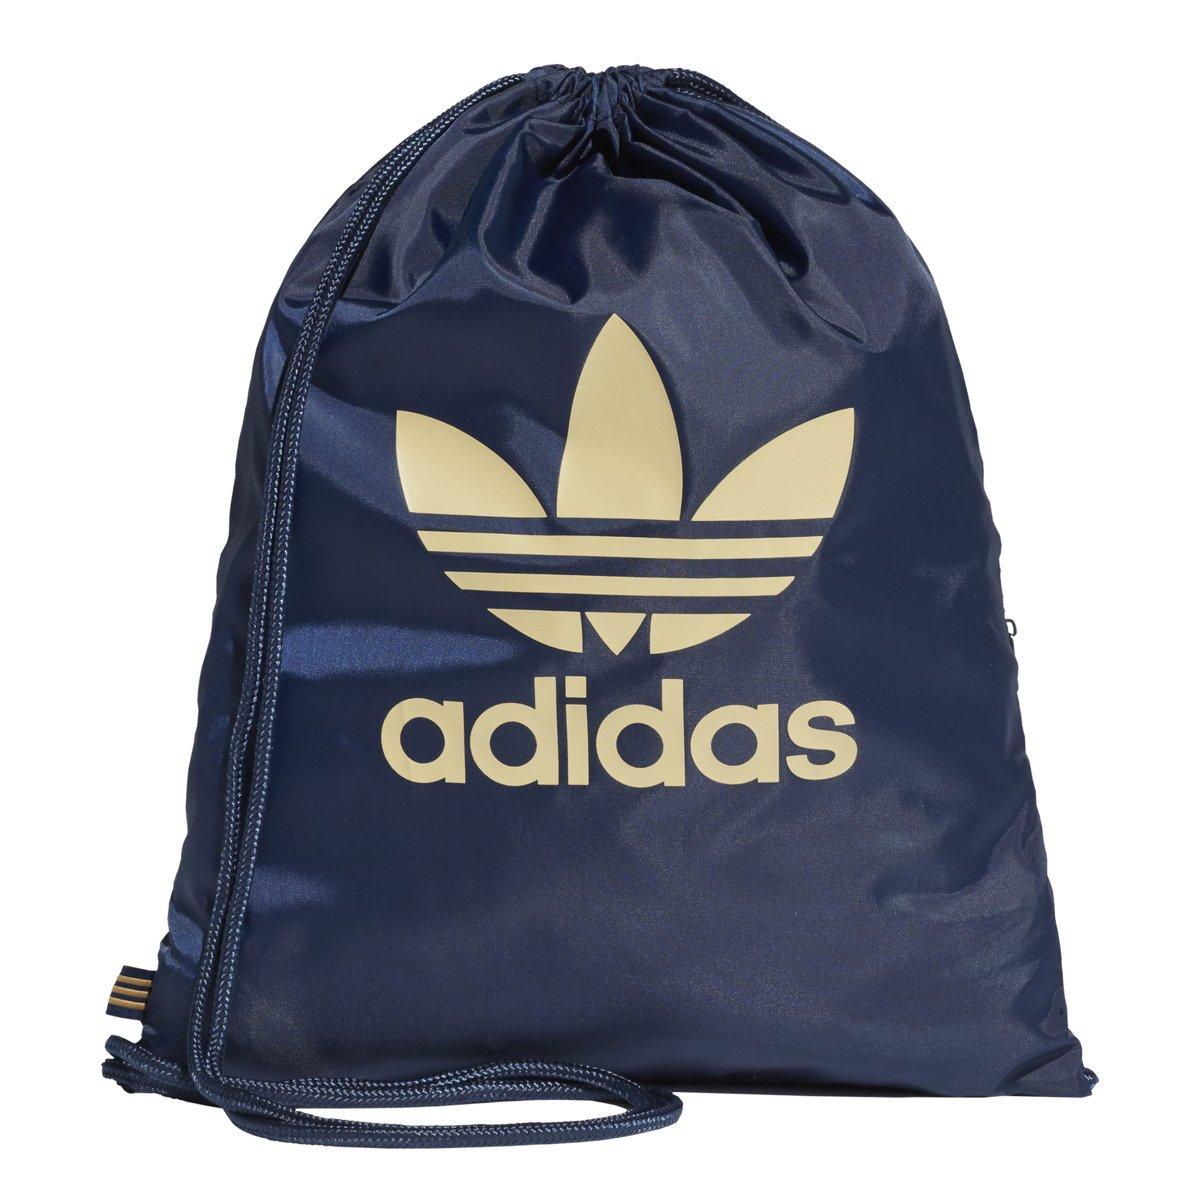 3b3ffc5a763f2 Worek Torba Adidas Originals Trefoil Gym sack - DV2389 - Basketo.pl